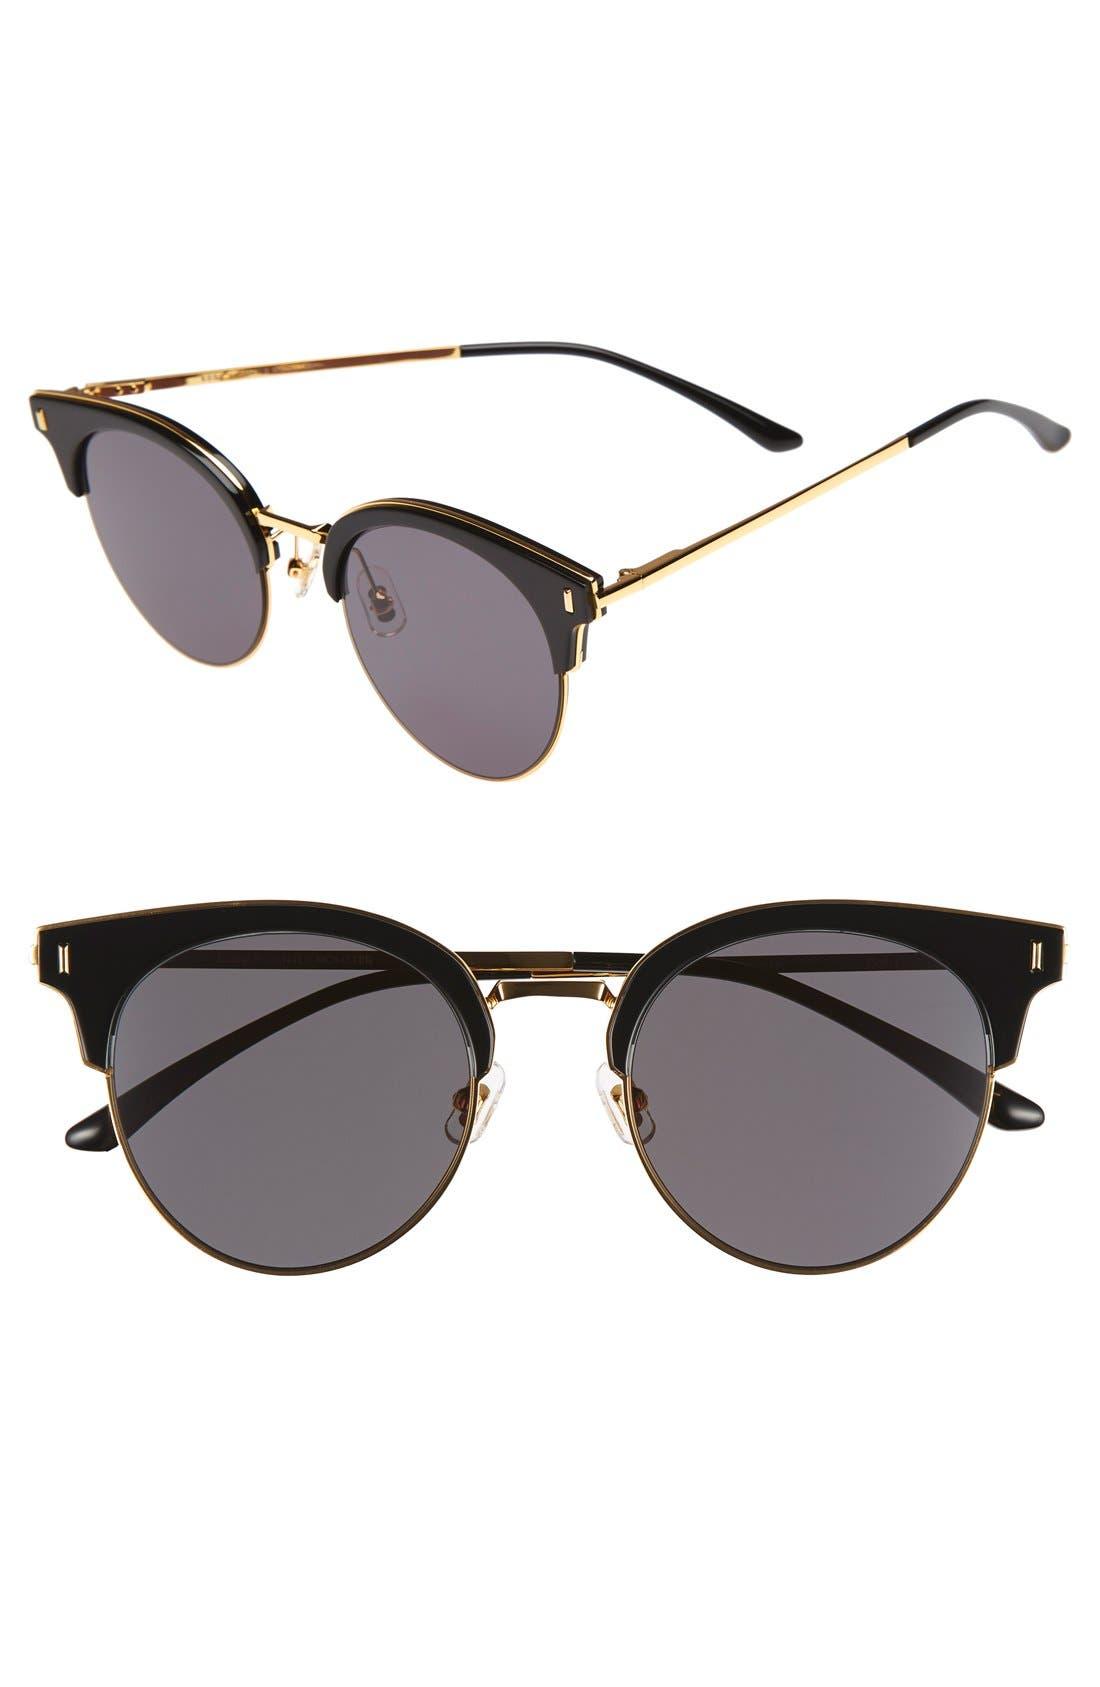 Alternate Image 1 Selected - Gentle Monster Sunglasses 'Kong Hyo Jin - Type 1' 58mm Sunglasses